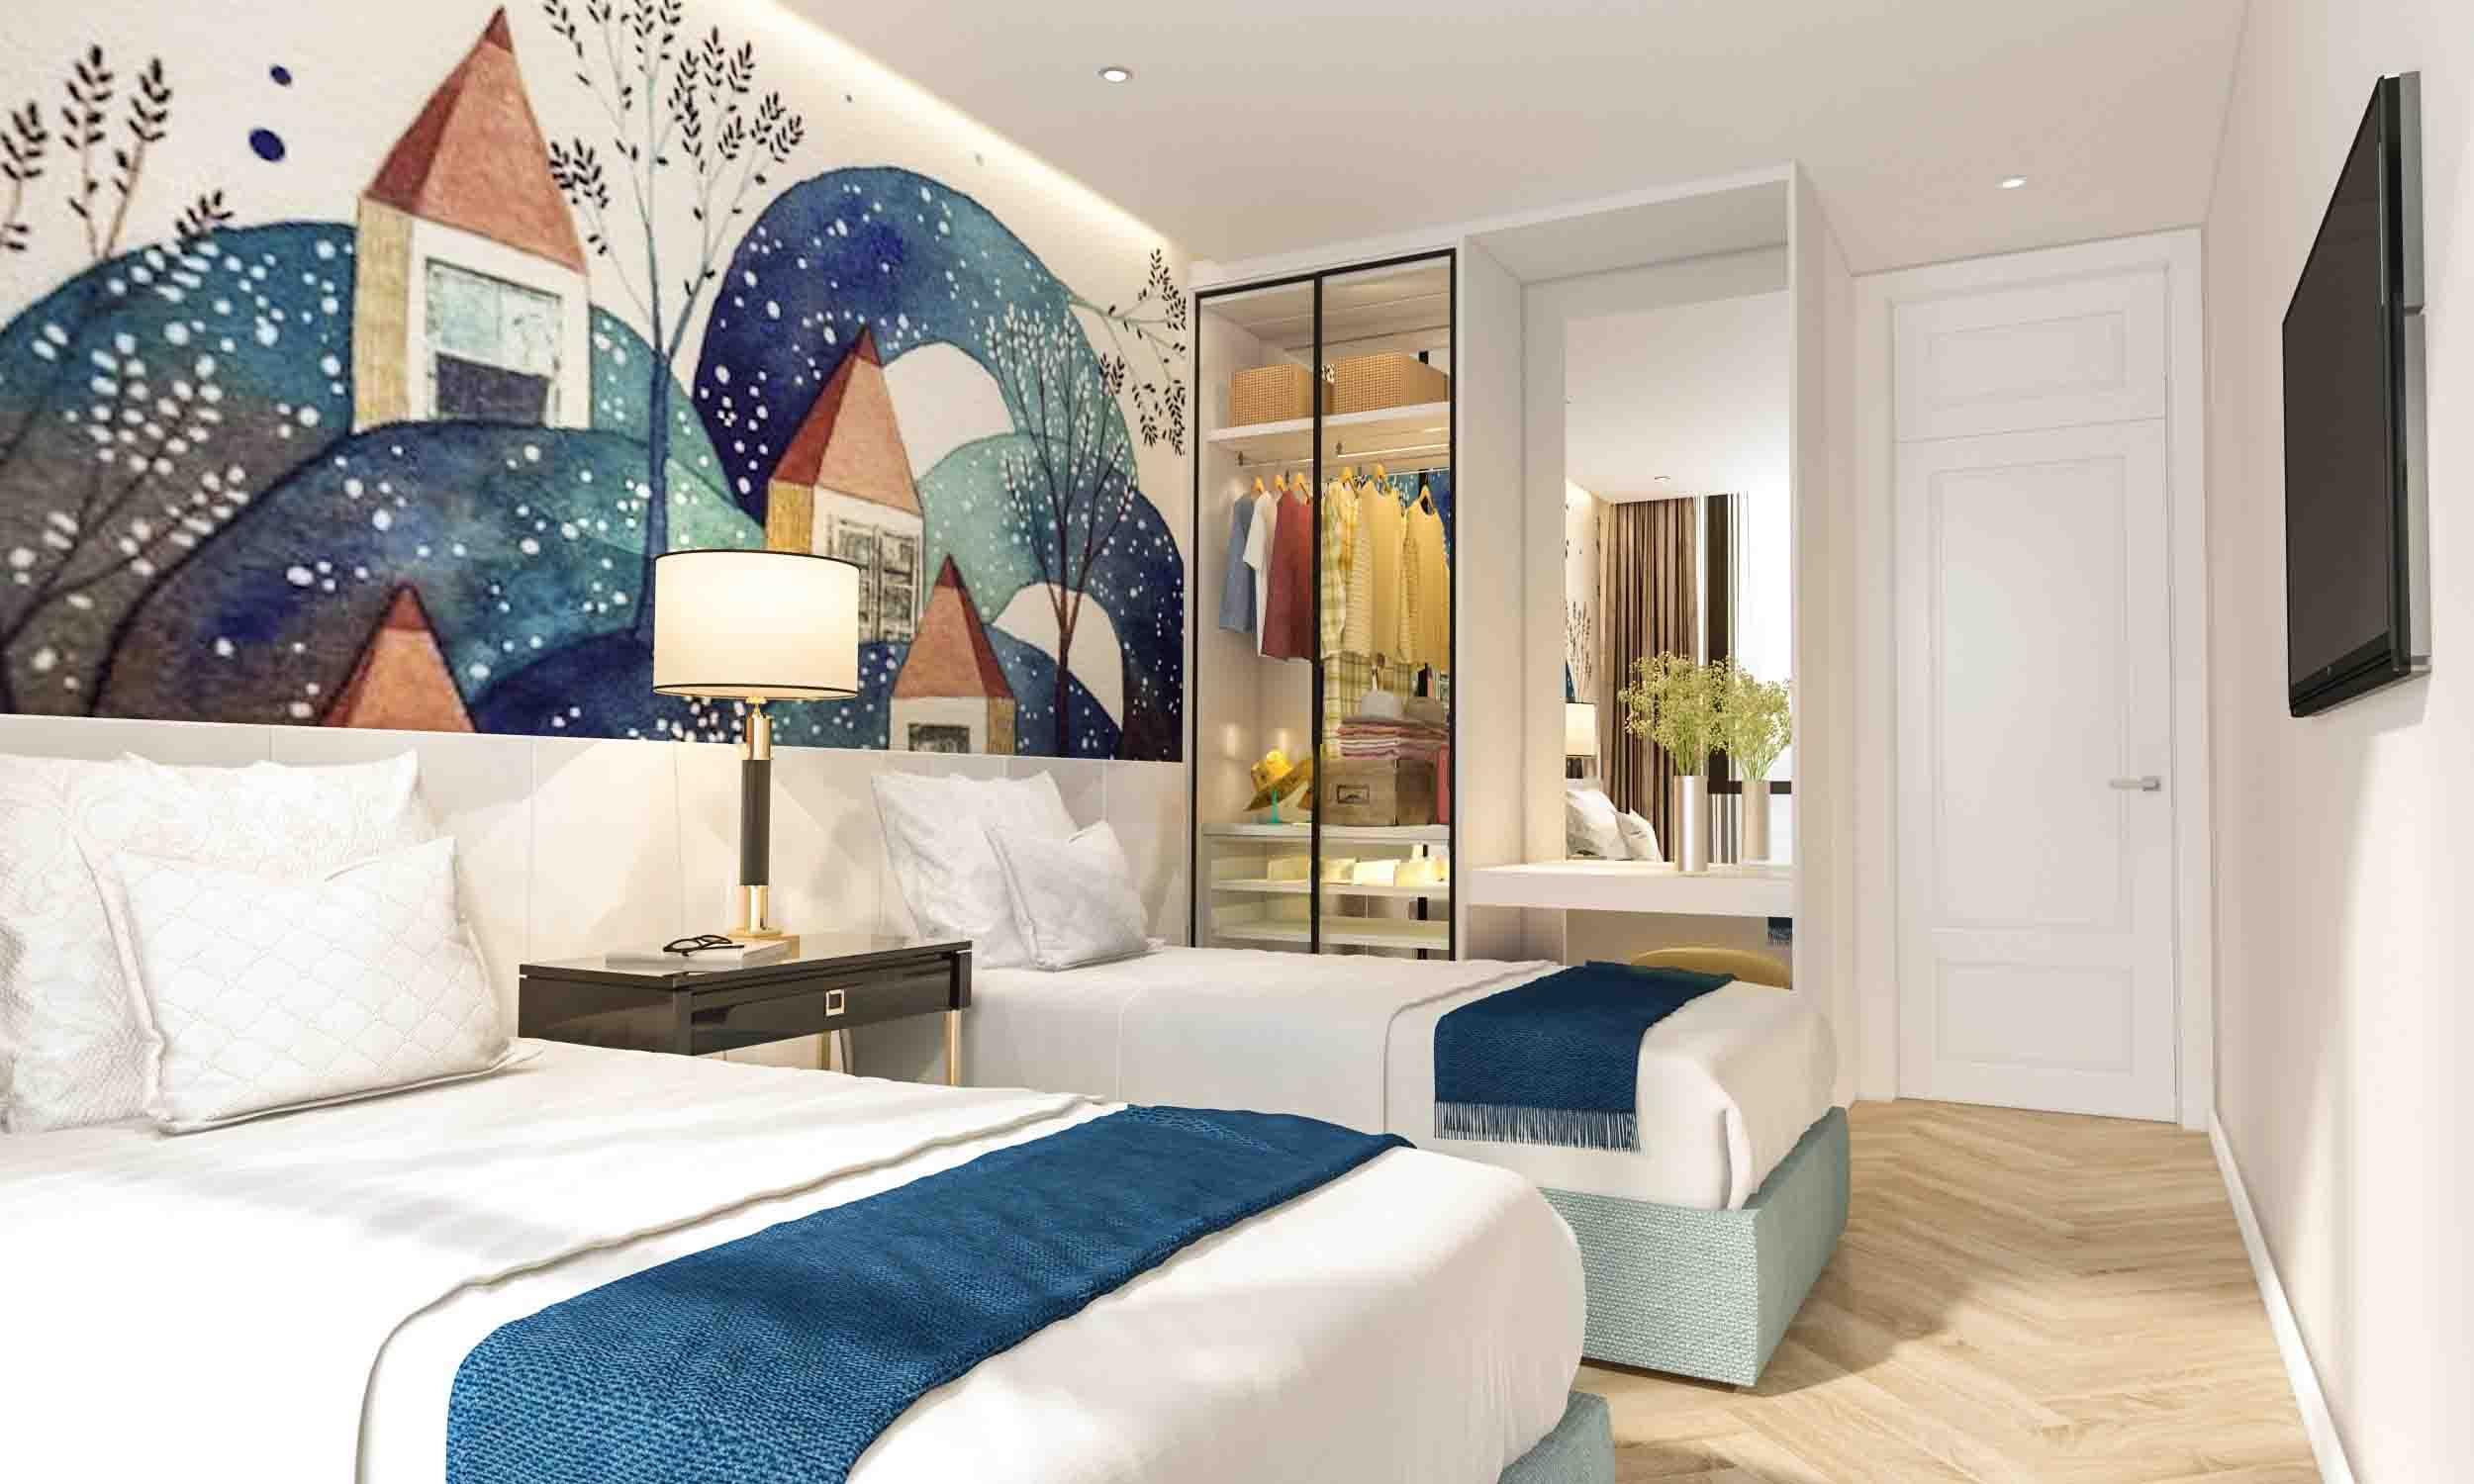 Chi tiết thiết kế trong căn hộ Coco Wonderland Resort